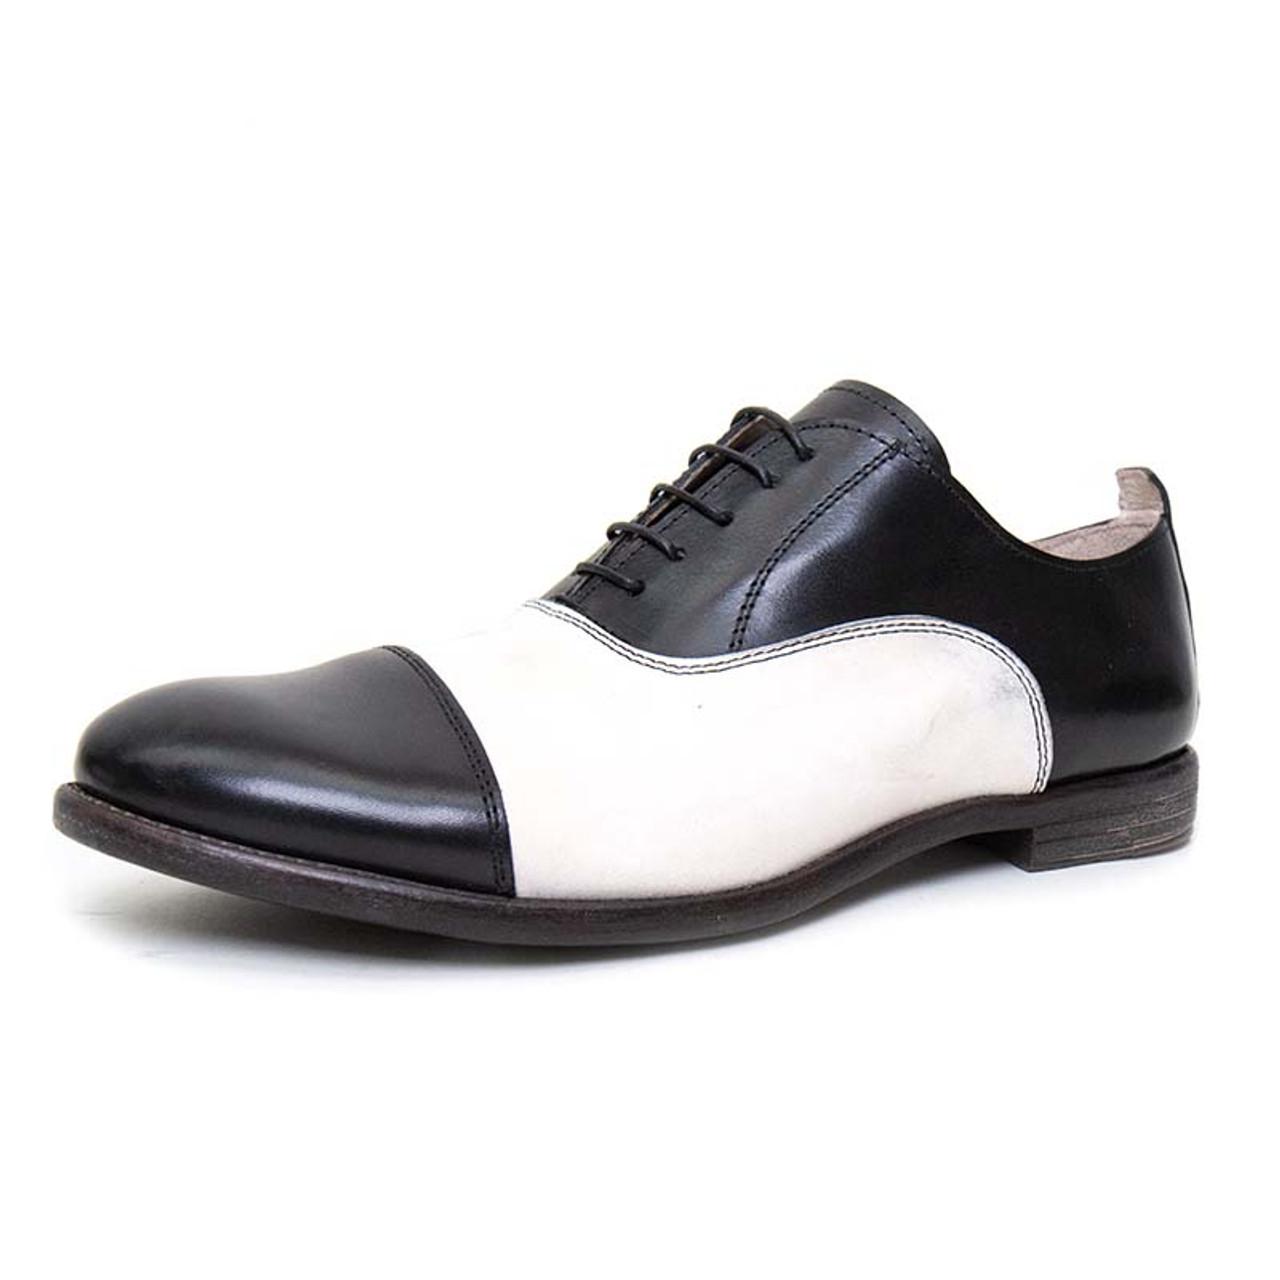 Moma Black \u0026 White Leather Derby Shoe